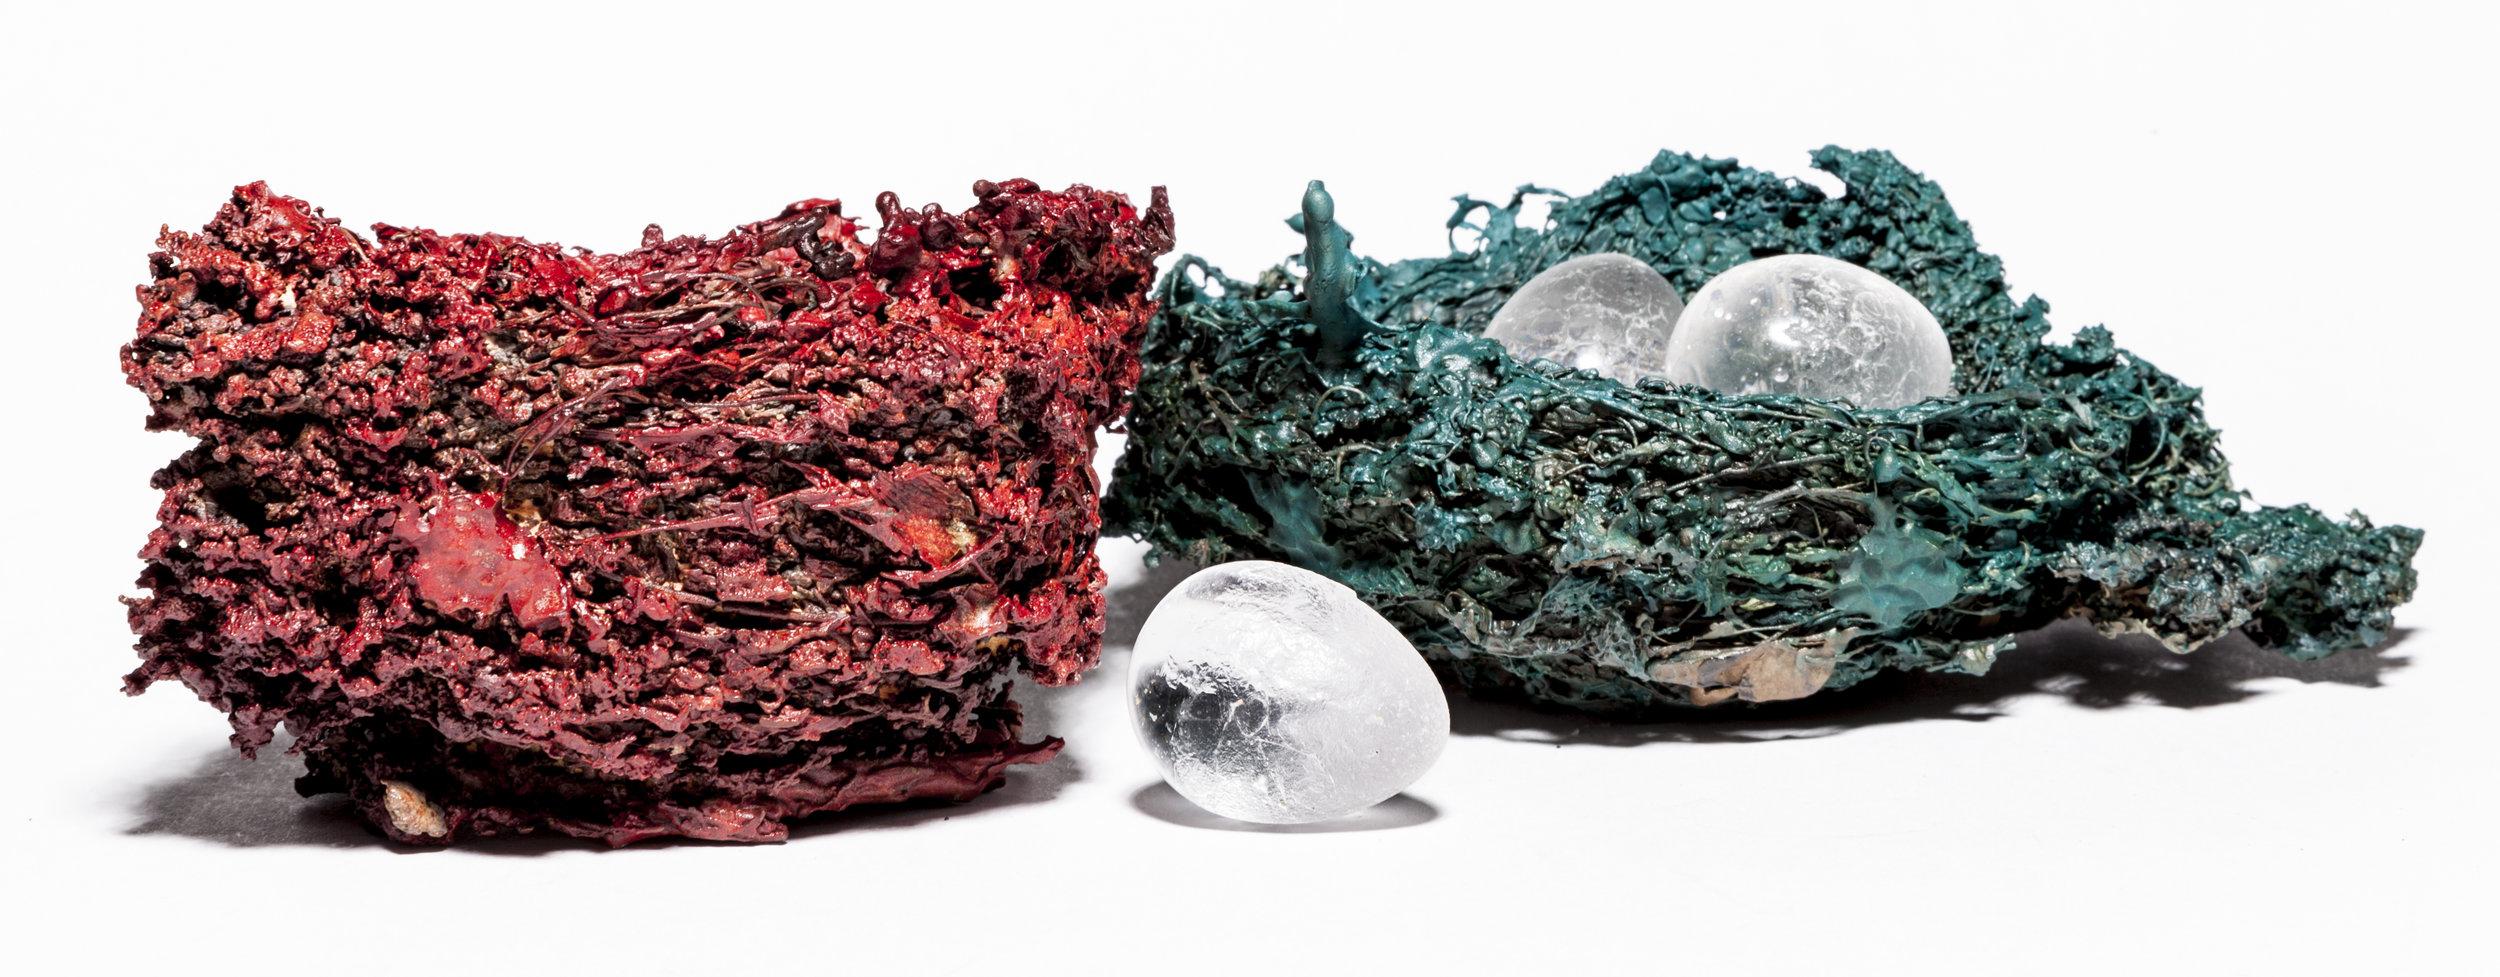 BaleCreekAllen Nests-037.jpg